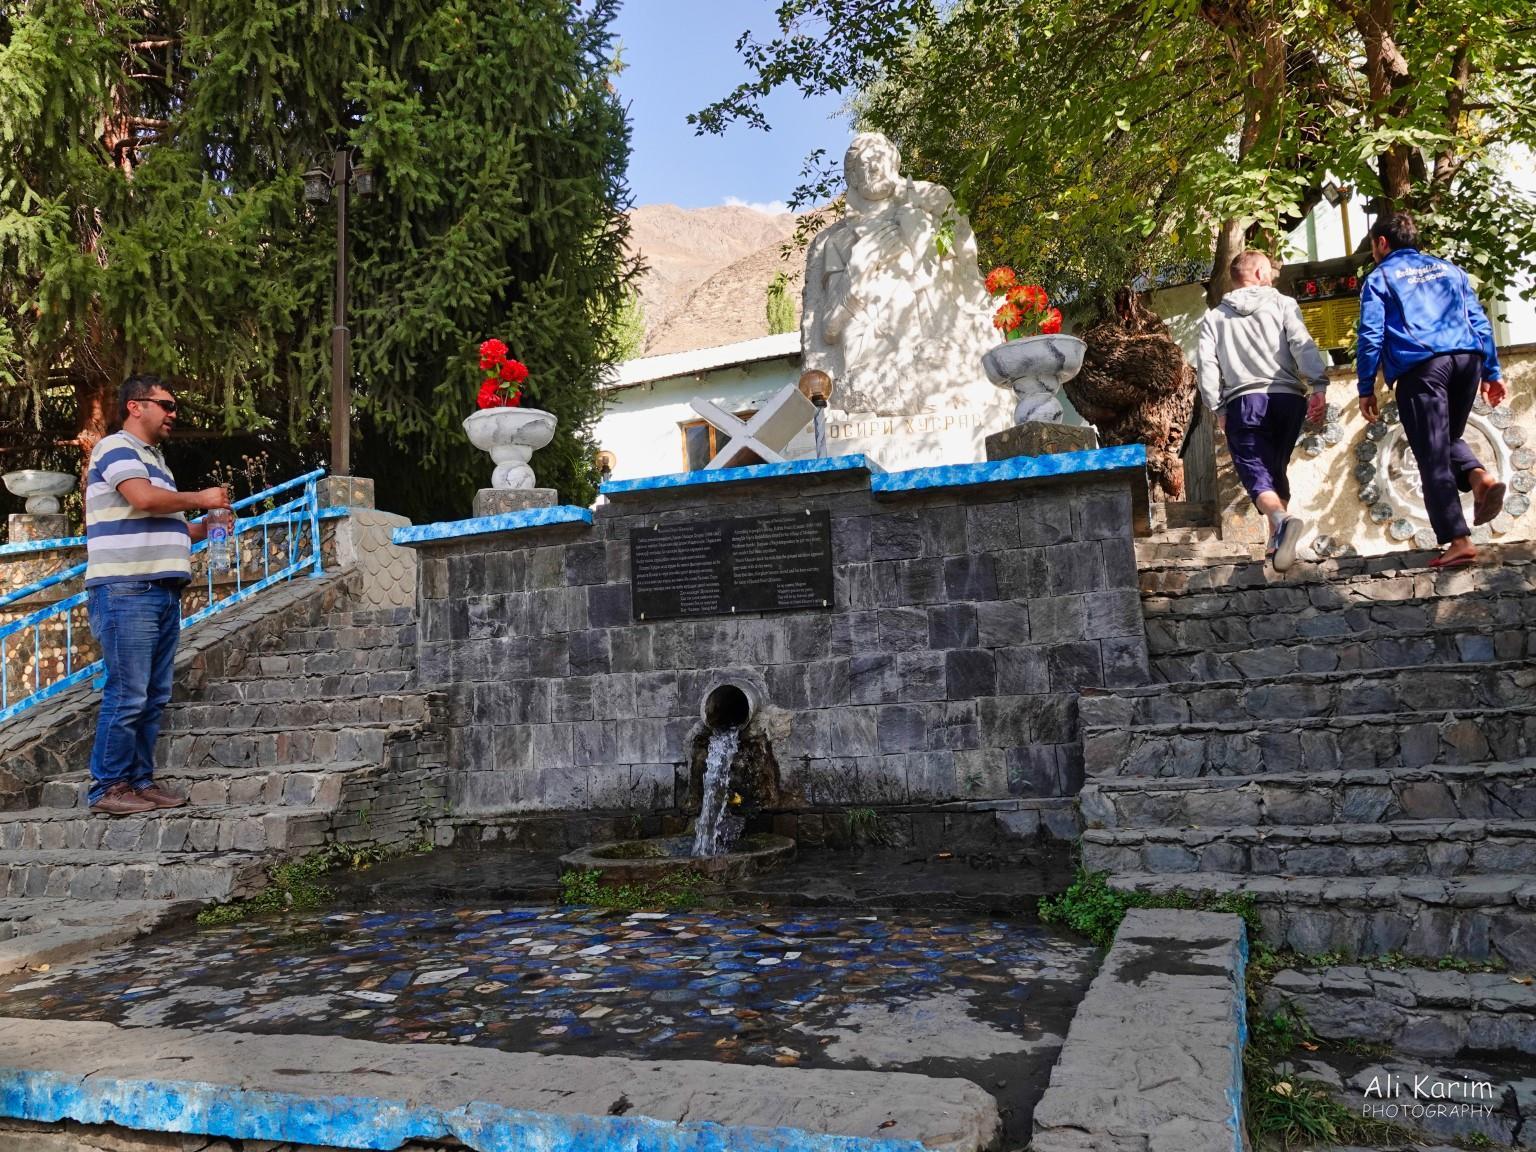 Dushanbe, Tajikistan Nasir Khusraw springs with his statue